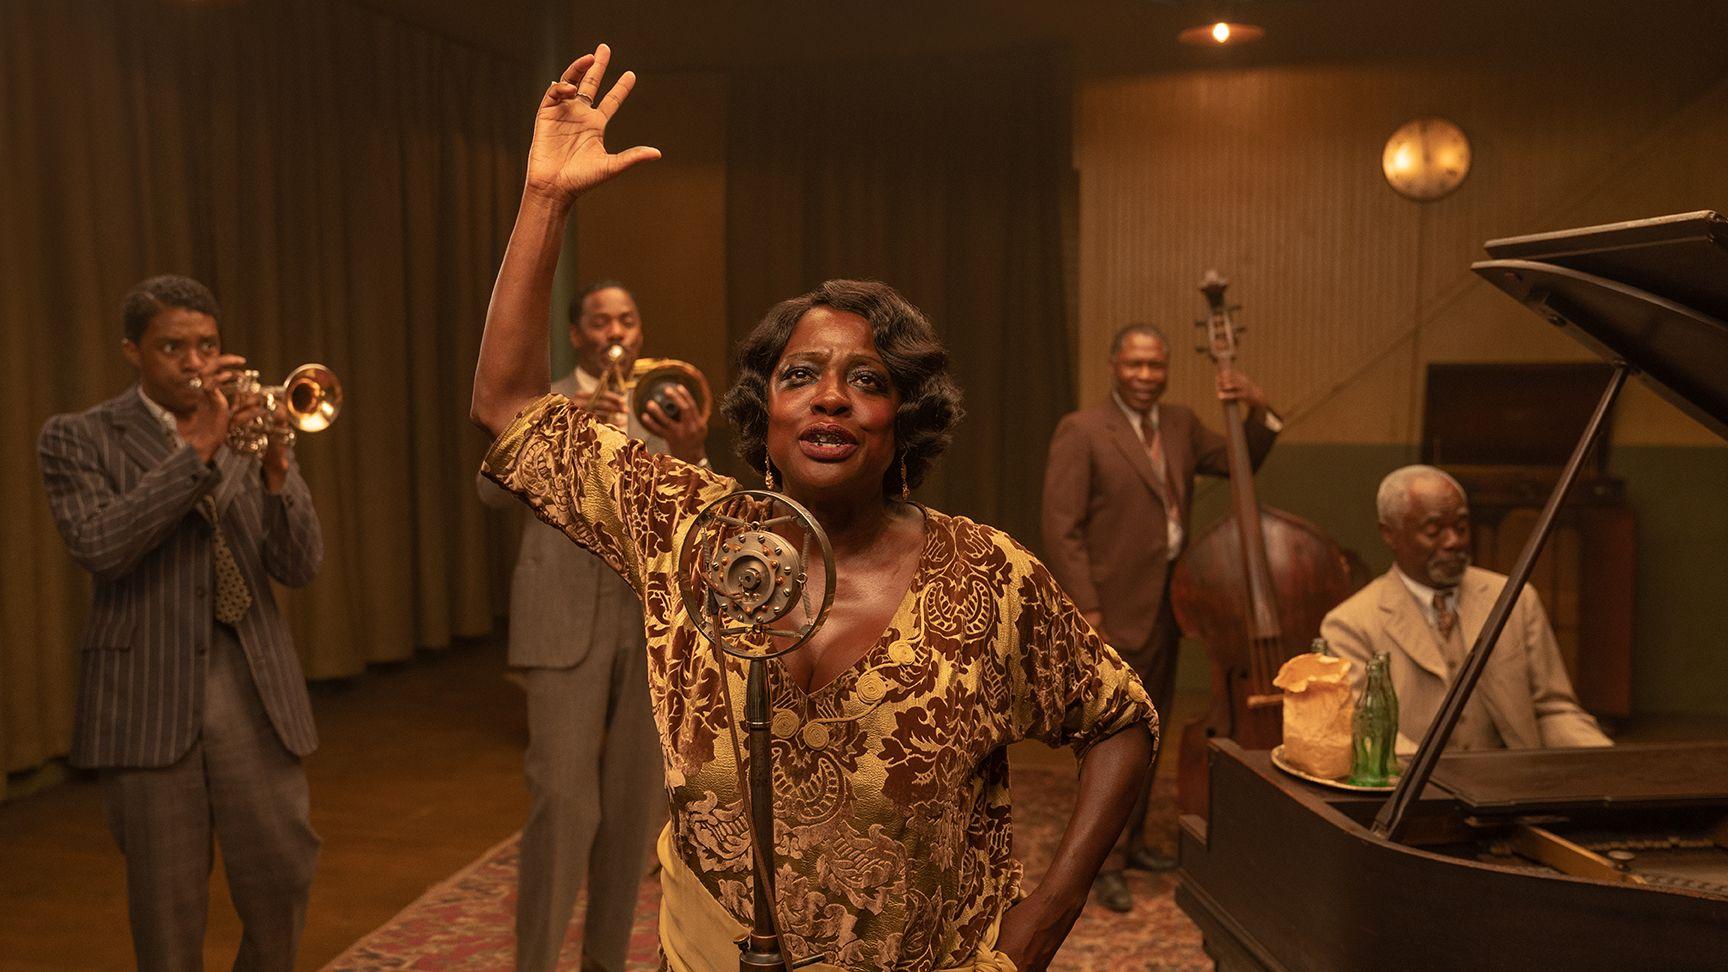 Here are the top picks. 52 Best Black Movies on Netflix 2021 - Black Films on Netflix